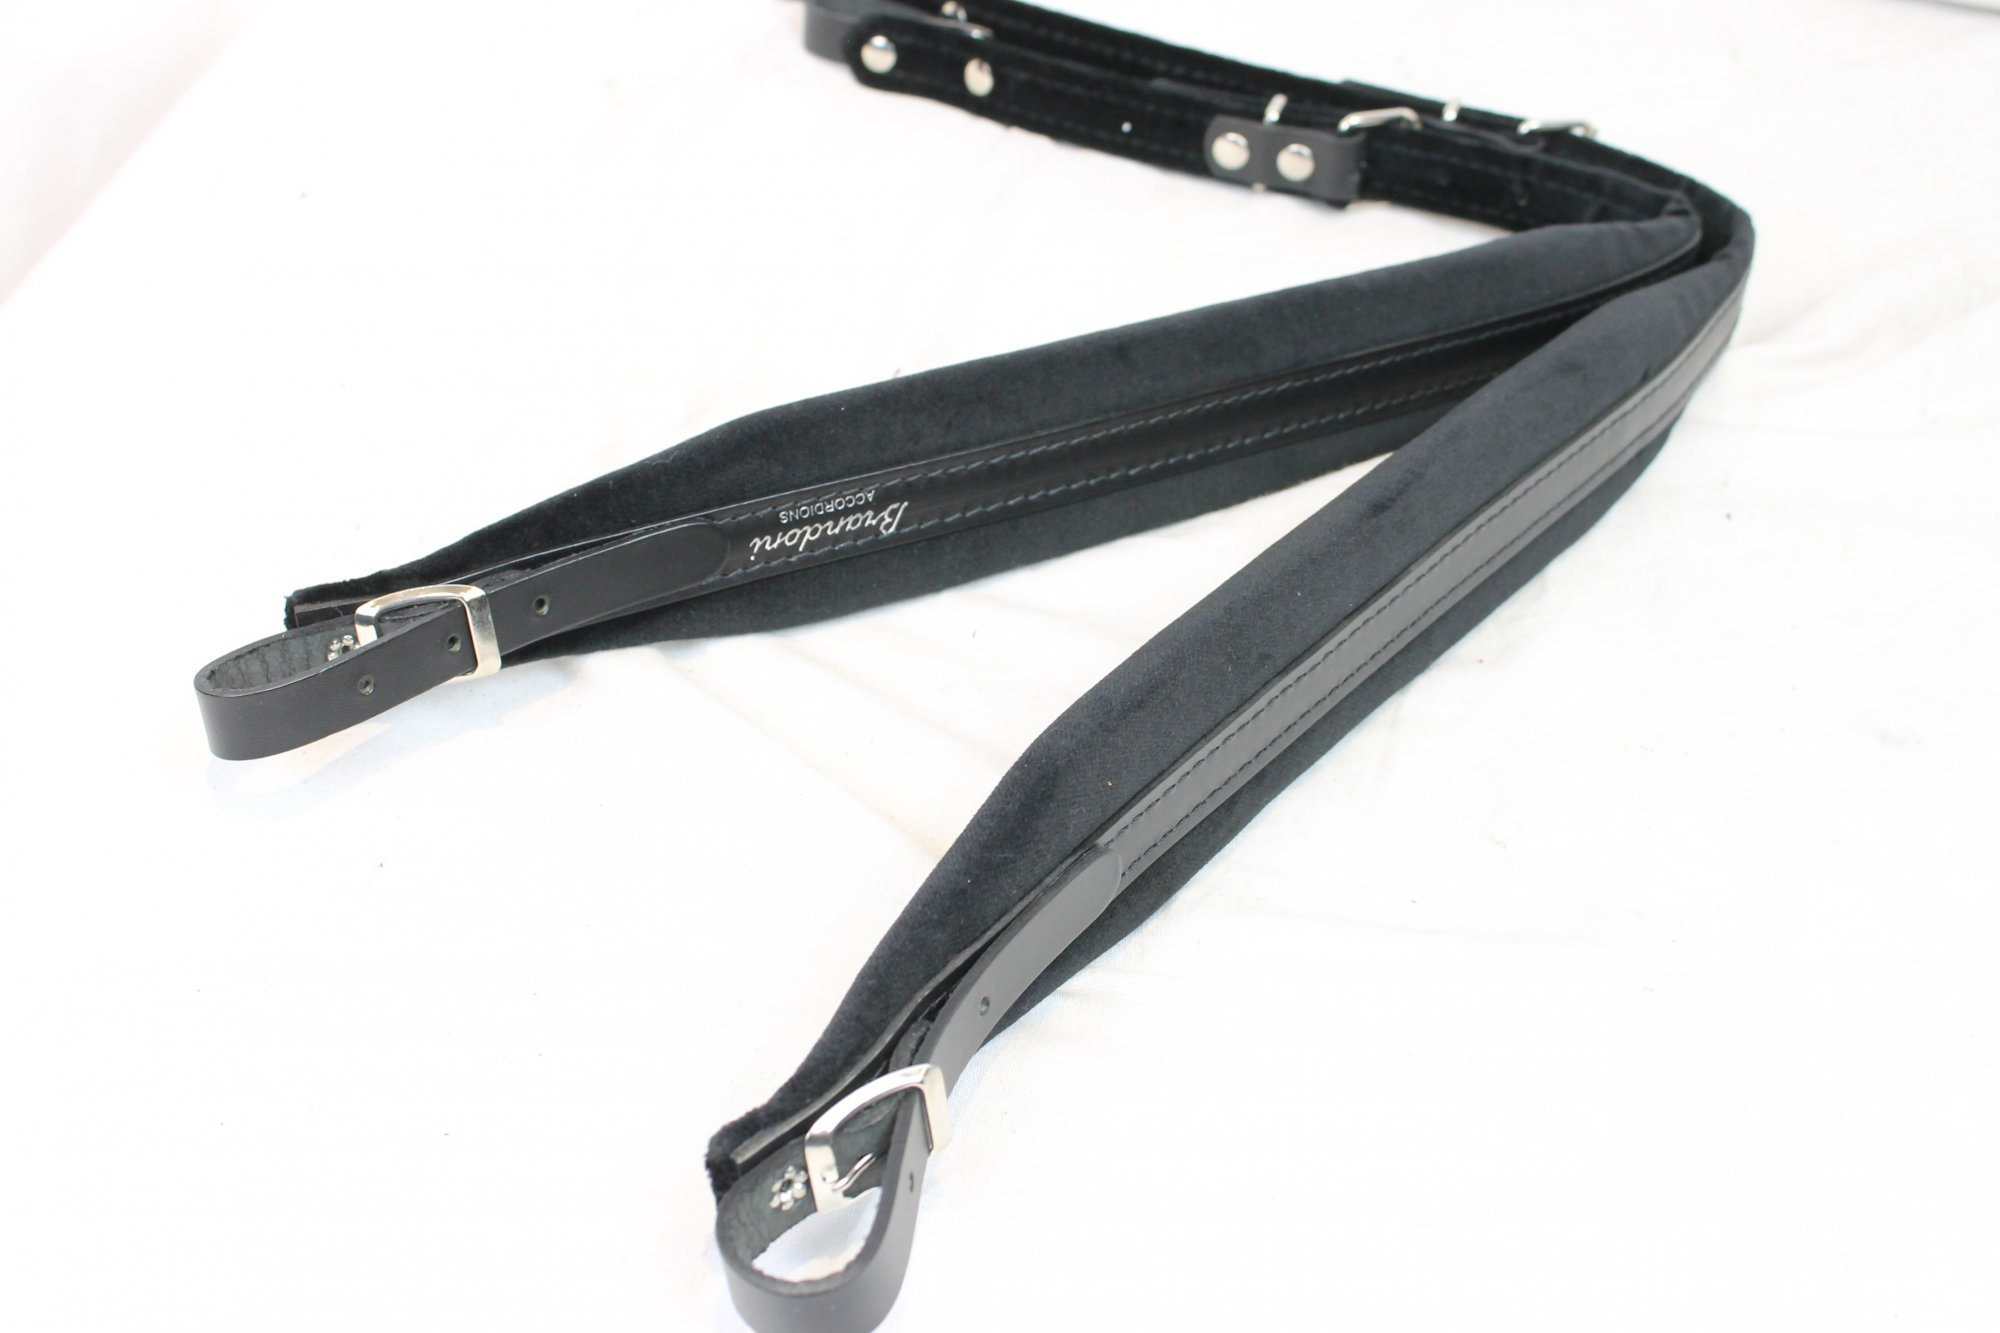 New Black Leather Velour Brandoni Accordion Shoulder Straps Width (5cm / 2in) Length (72~84cm / 28.5~33in)